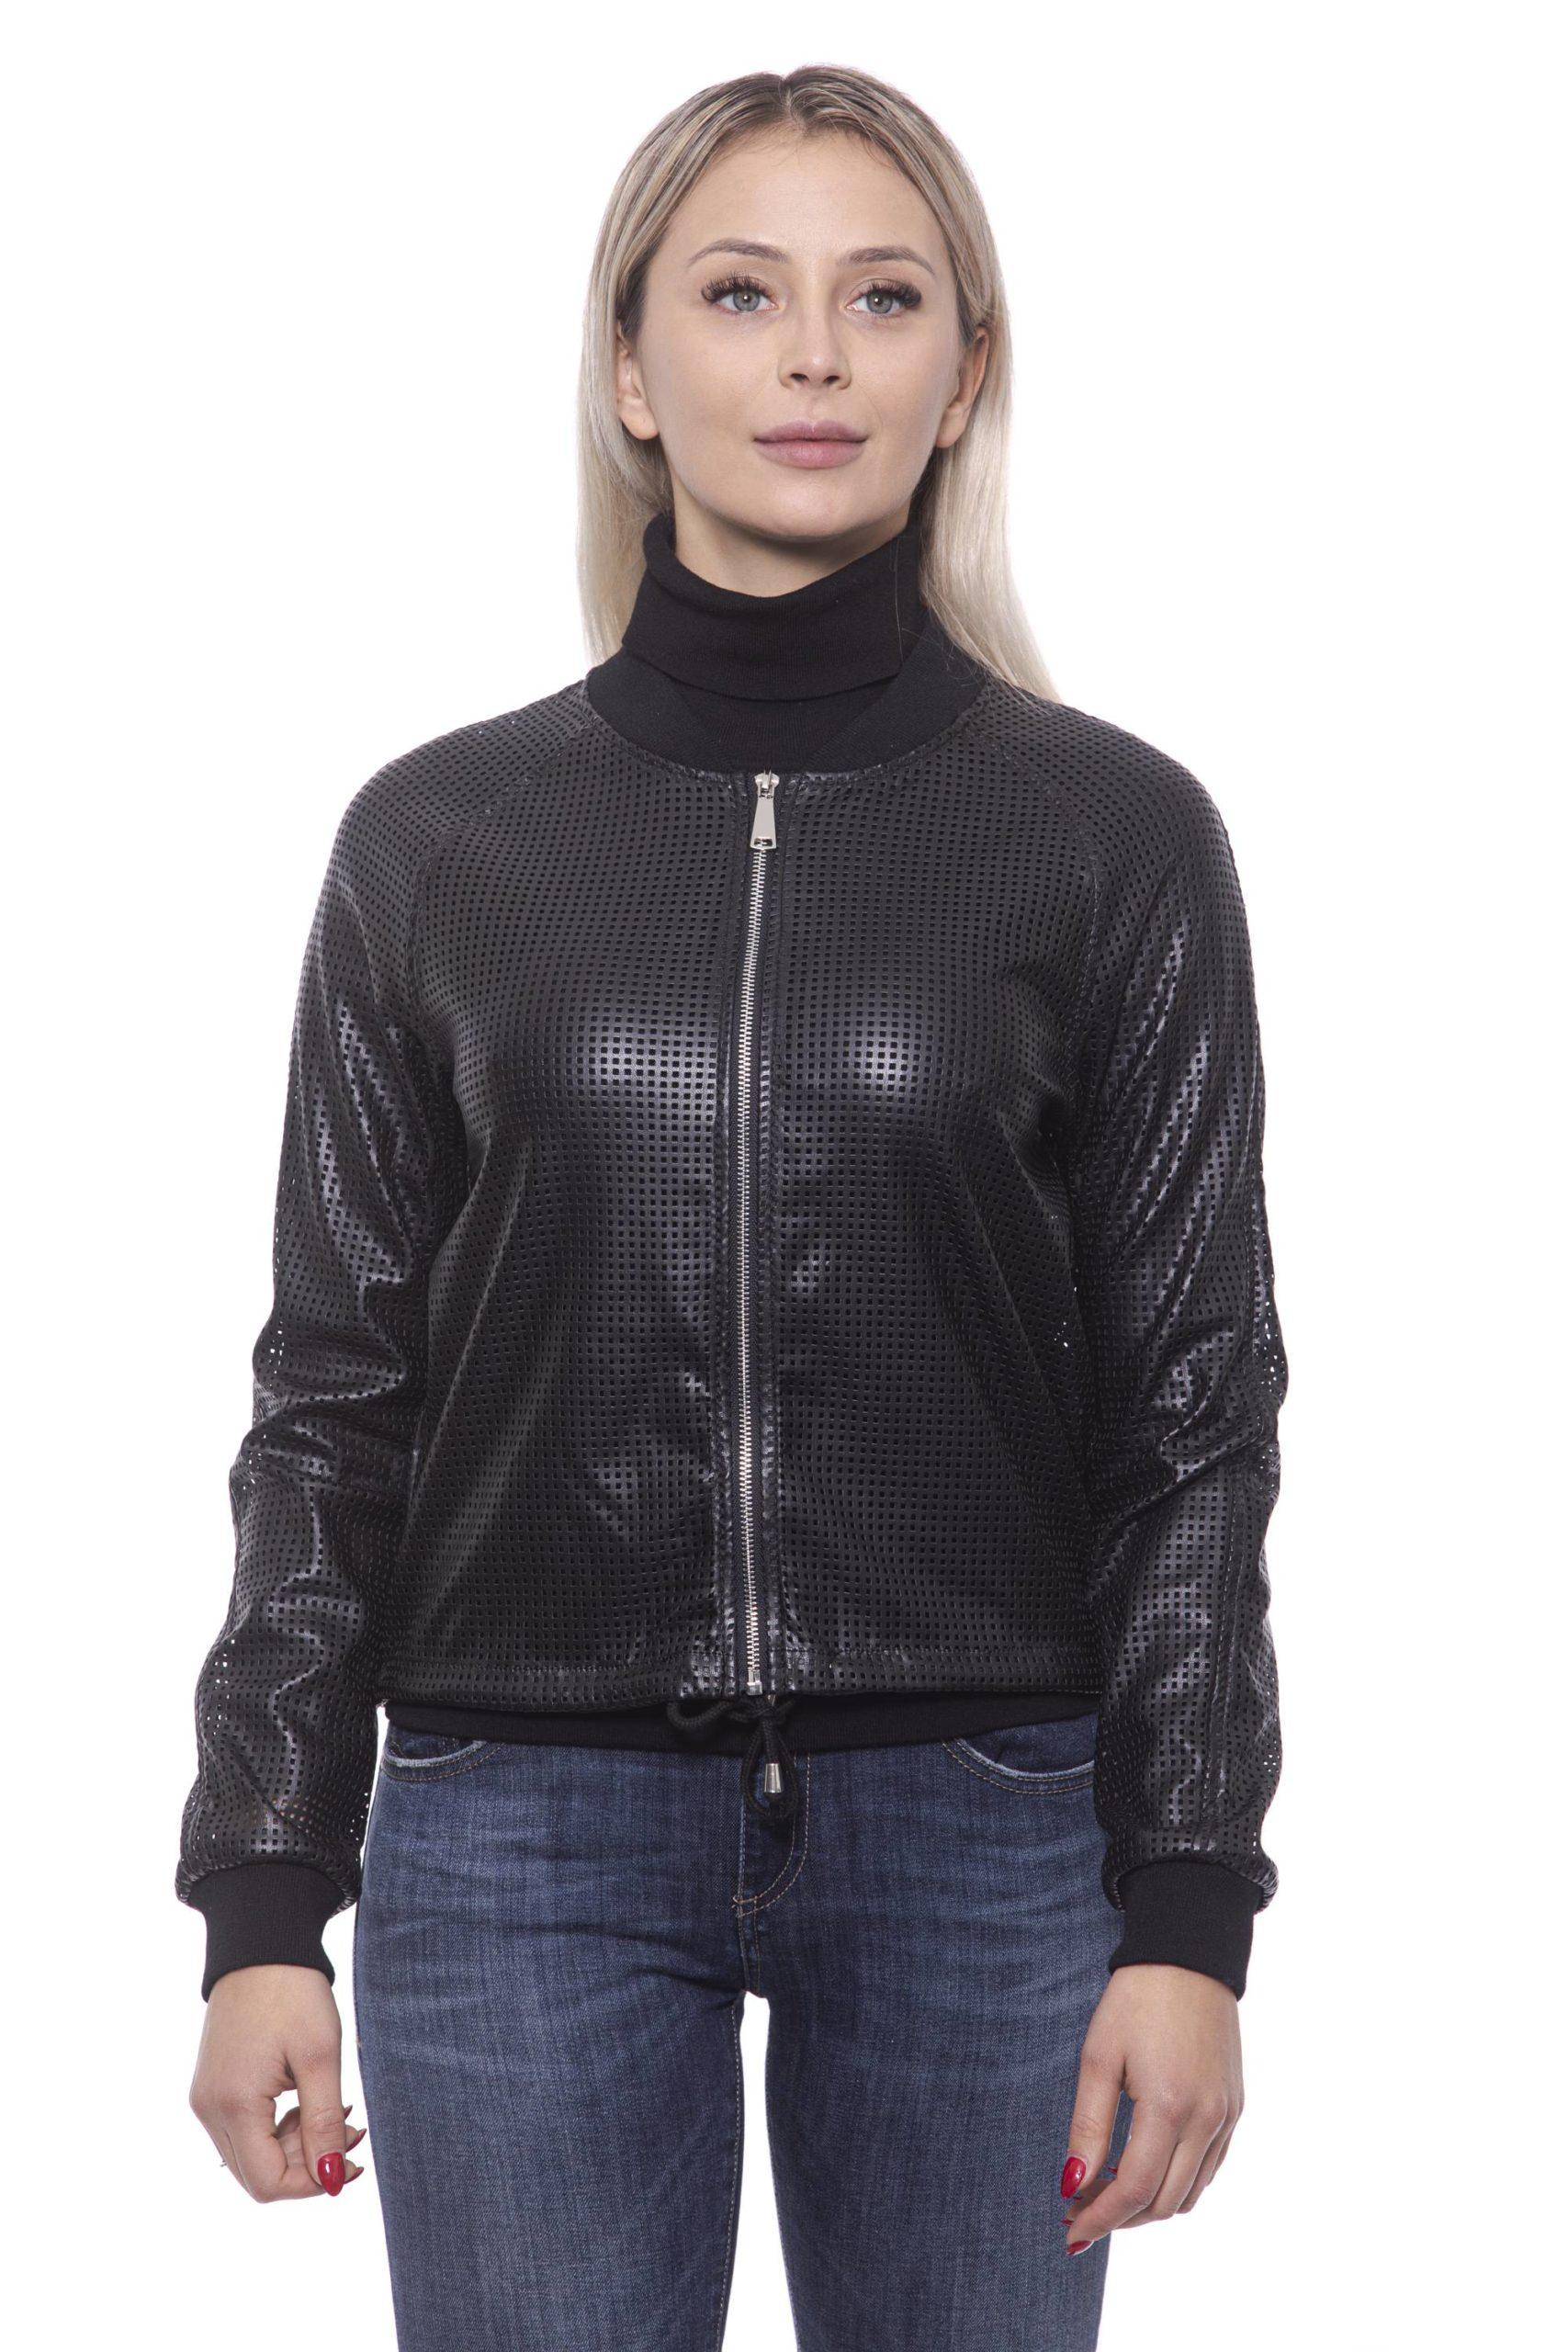 19V69 Italia Women's Nero Jacket 191388299 - IT42 | S